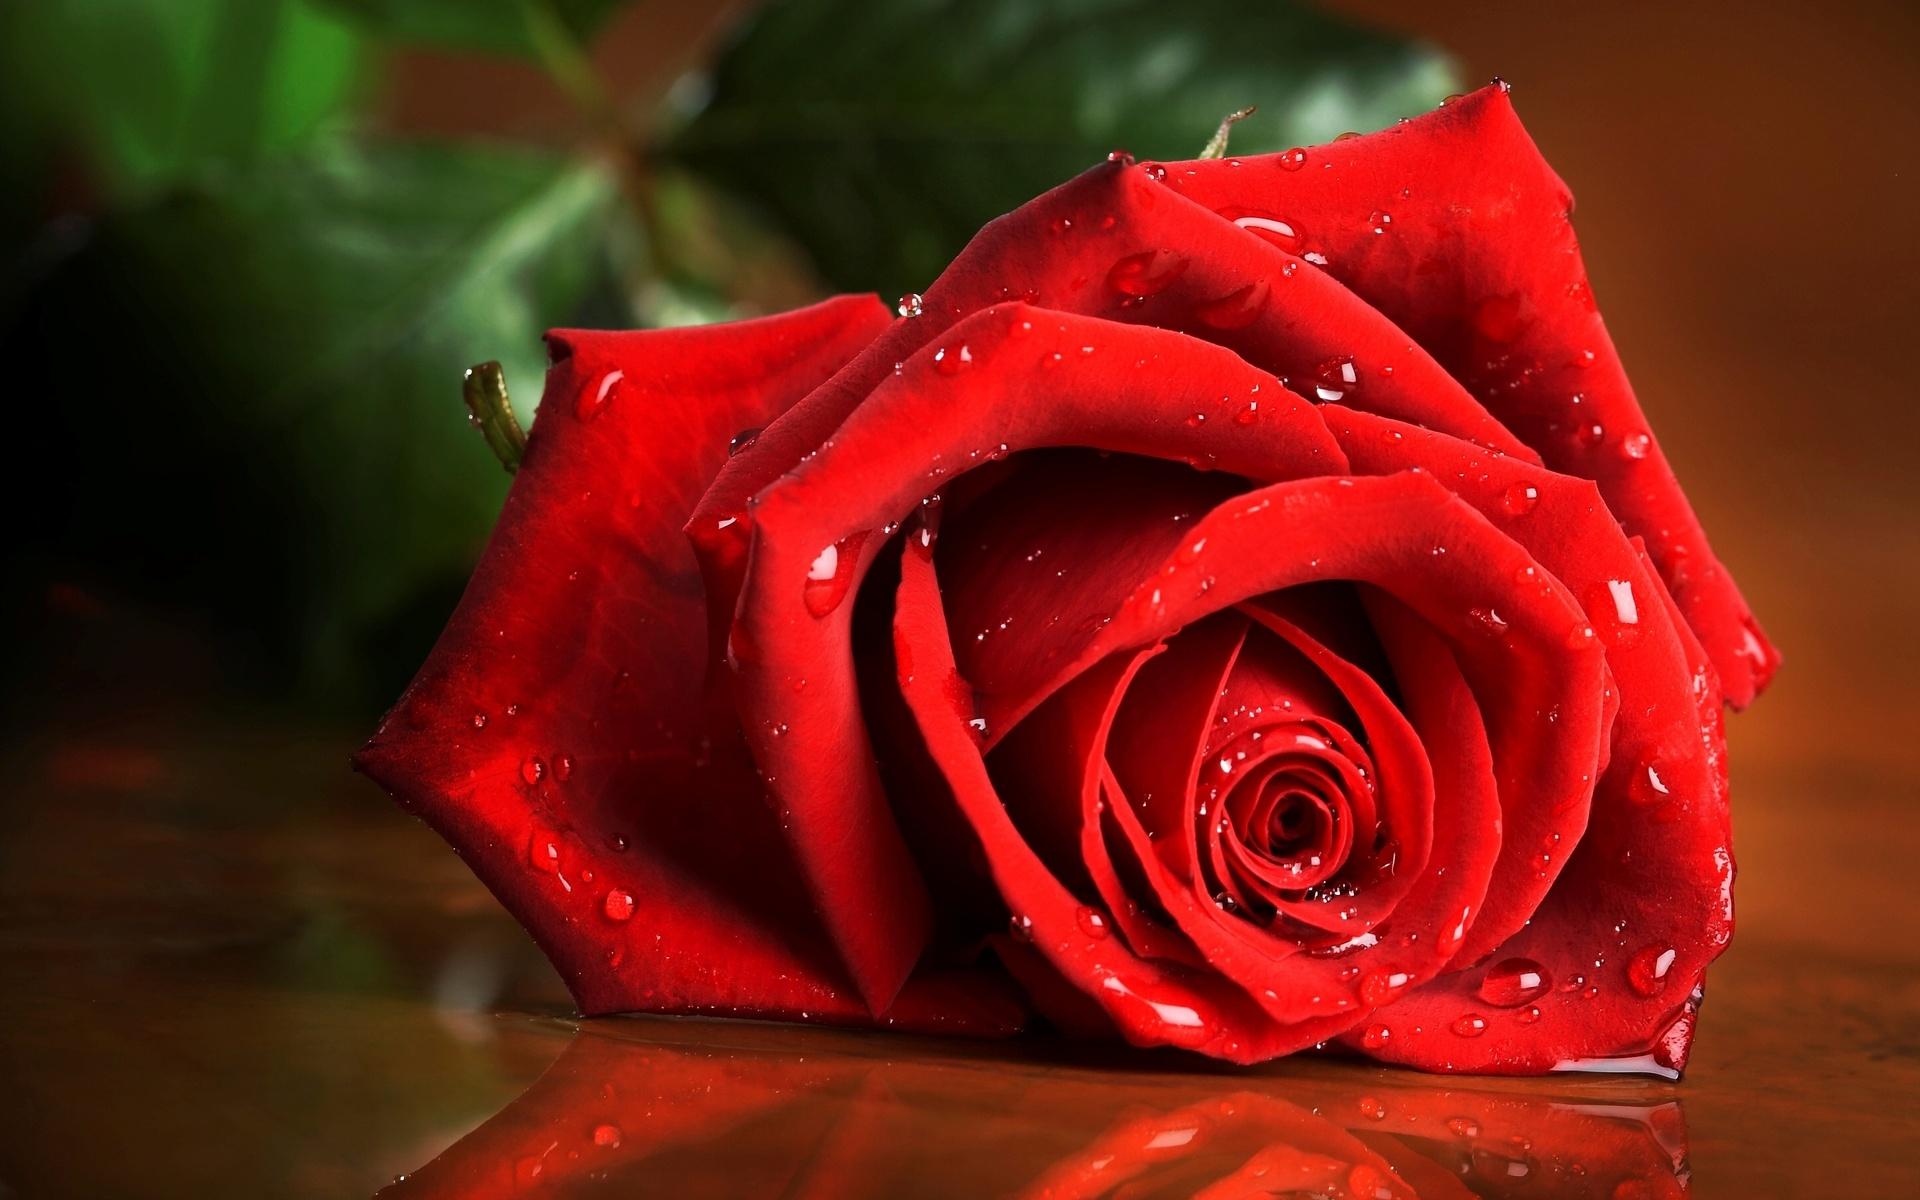 Love Romance Mood Roses Flowers Drops Wallpaper